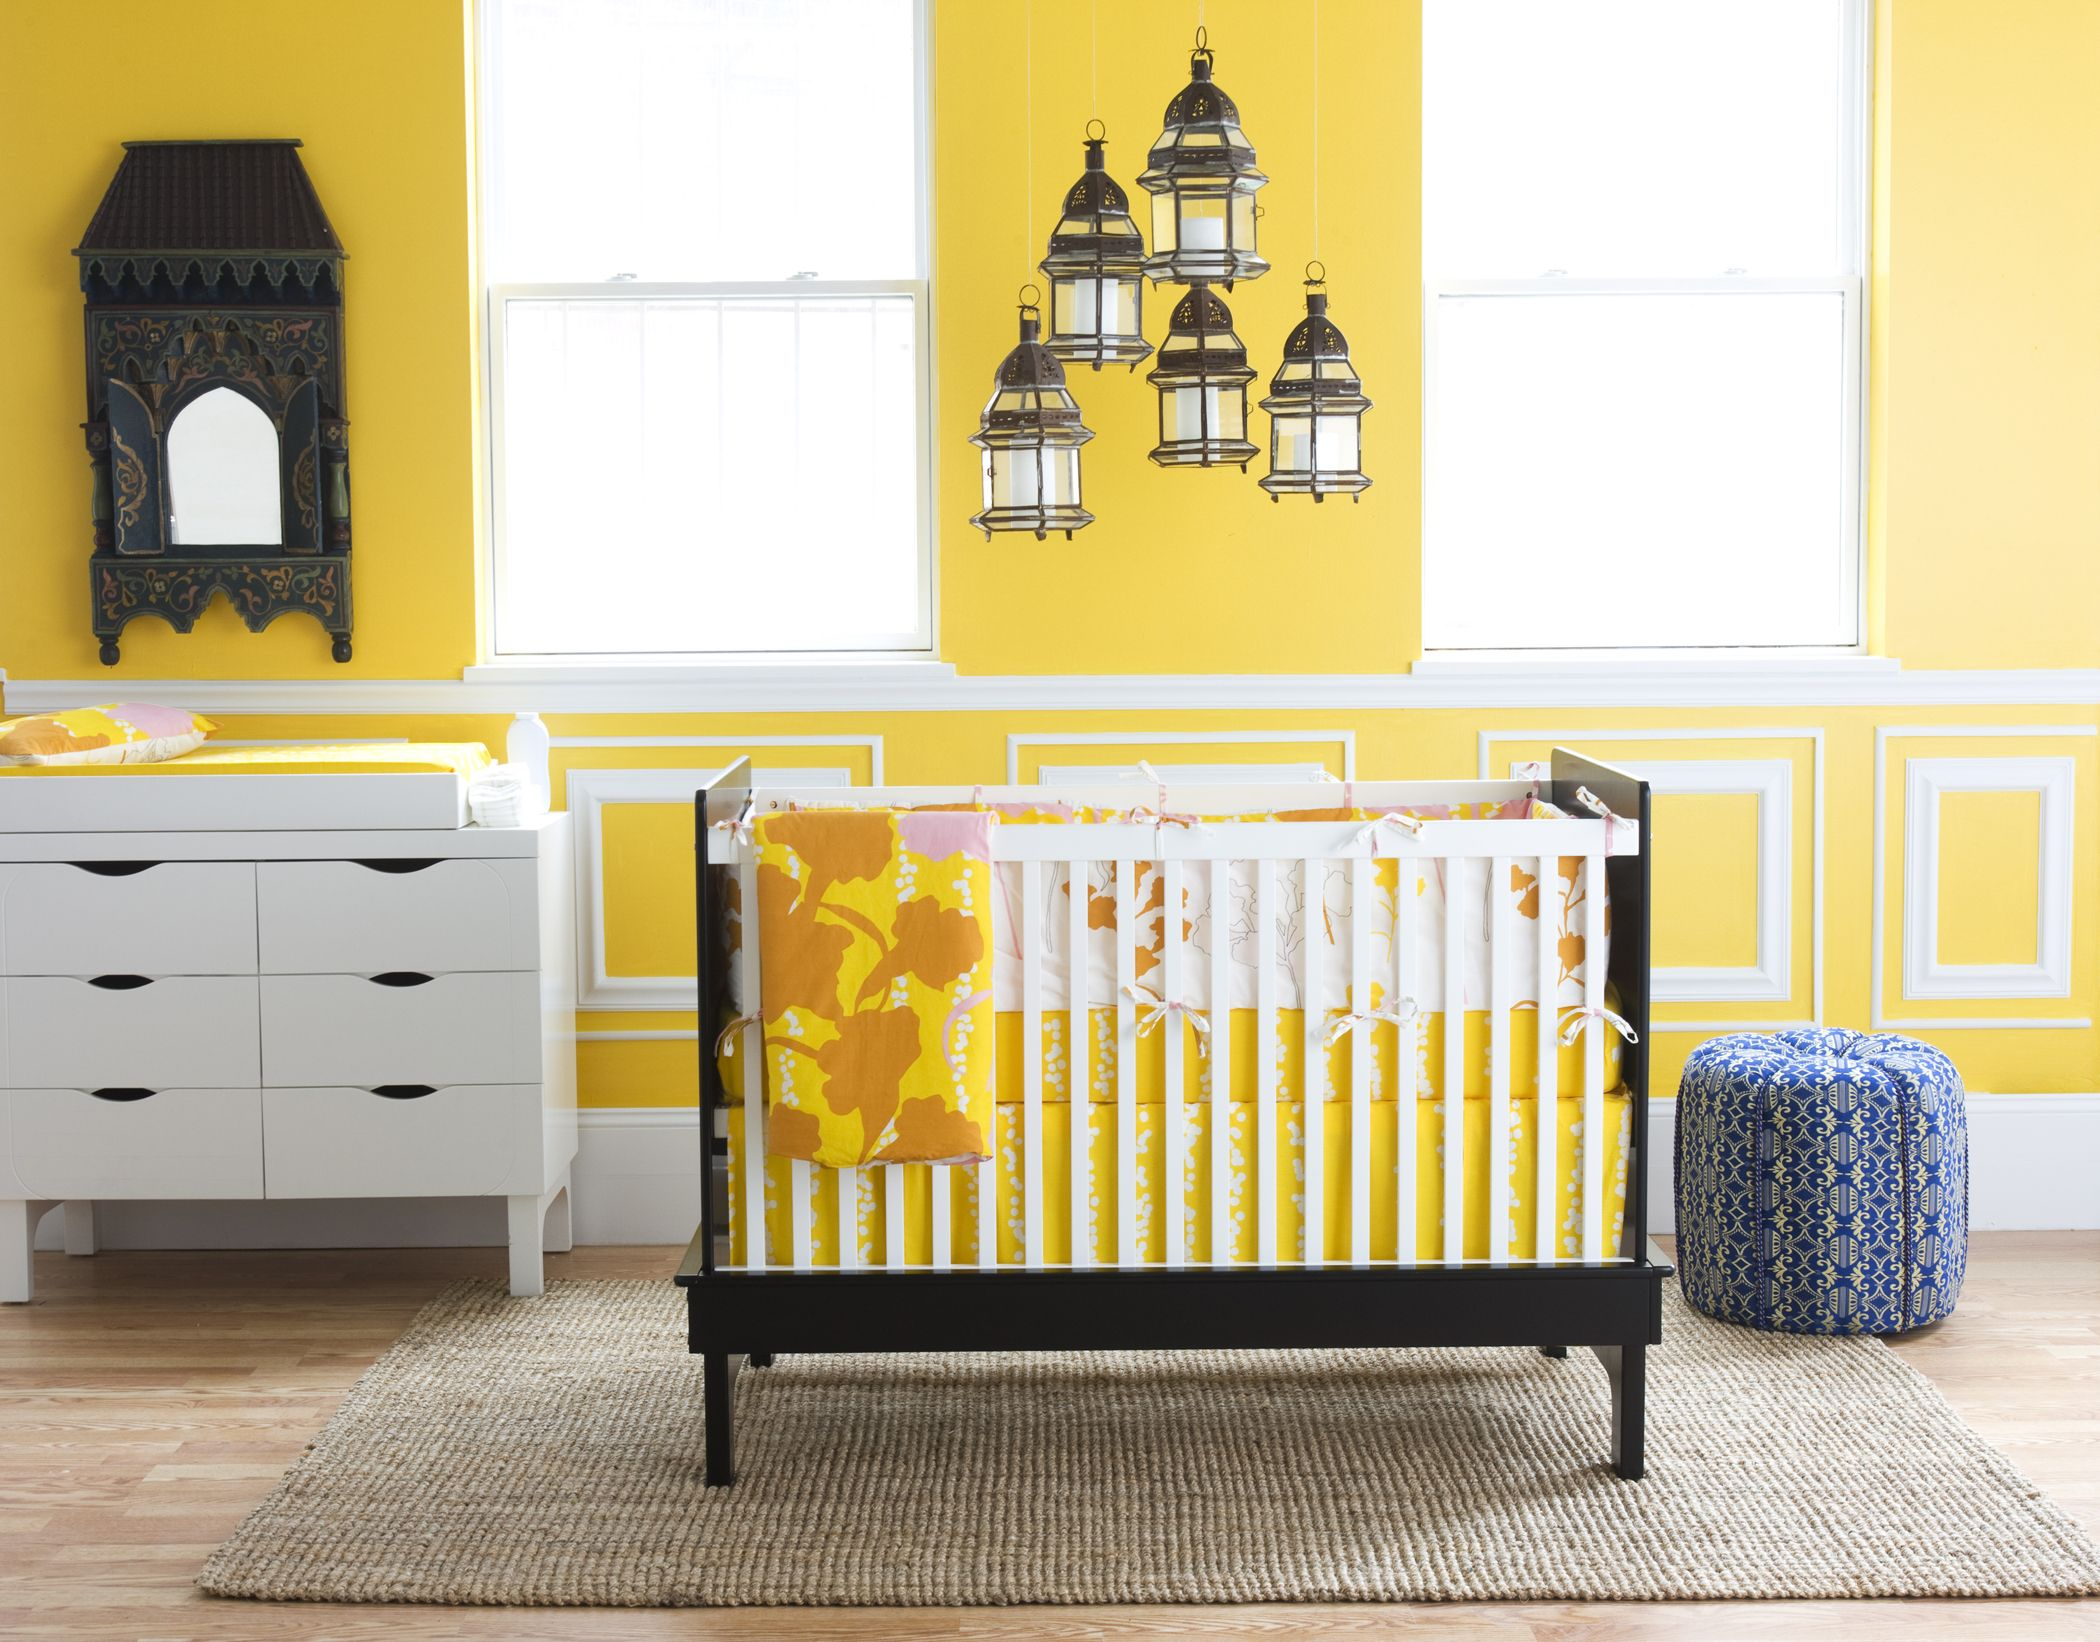 Argington Sahara Crib with Ginko Bedding and yellow walls ...